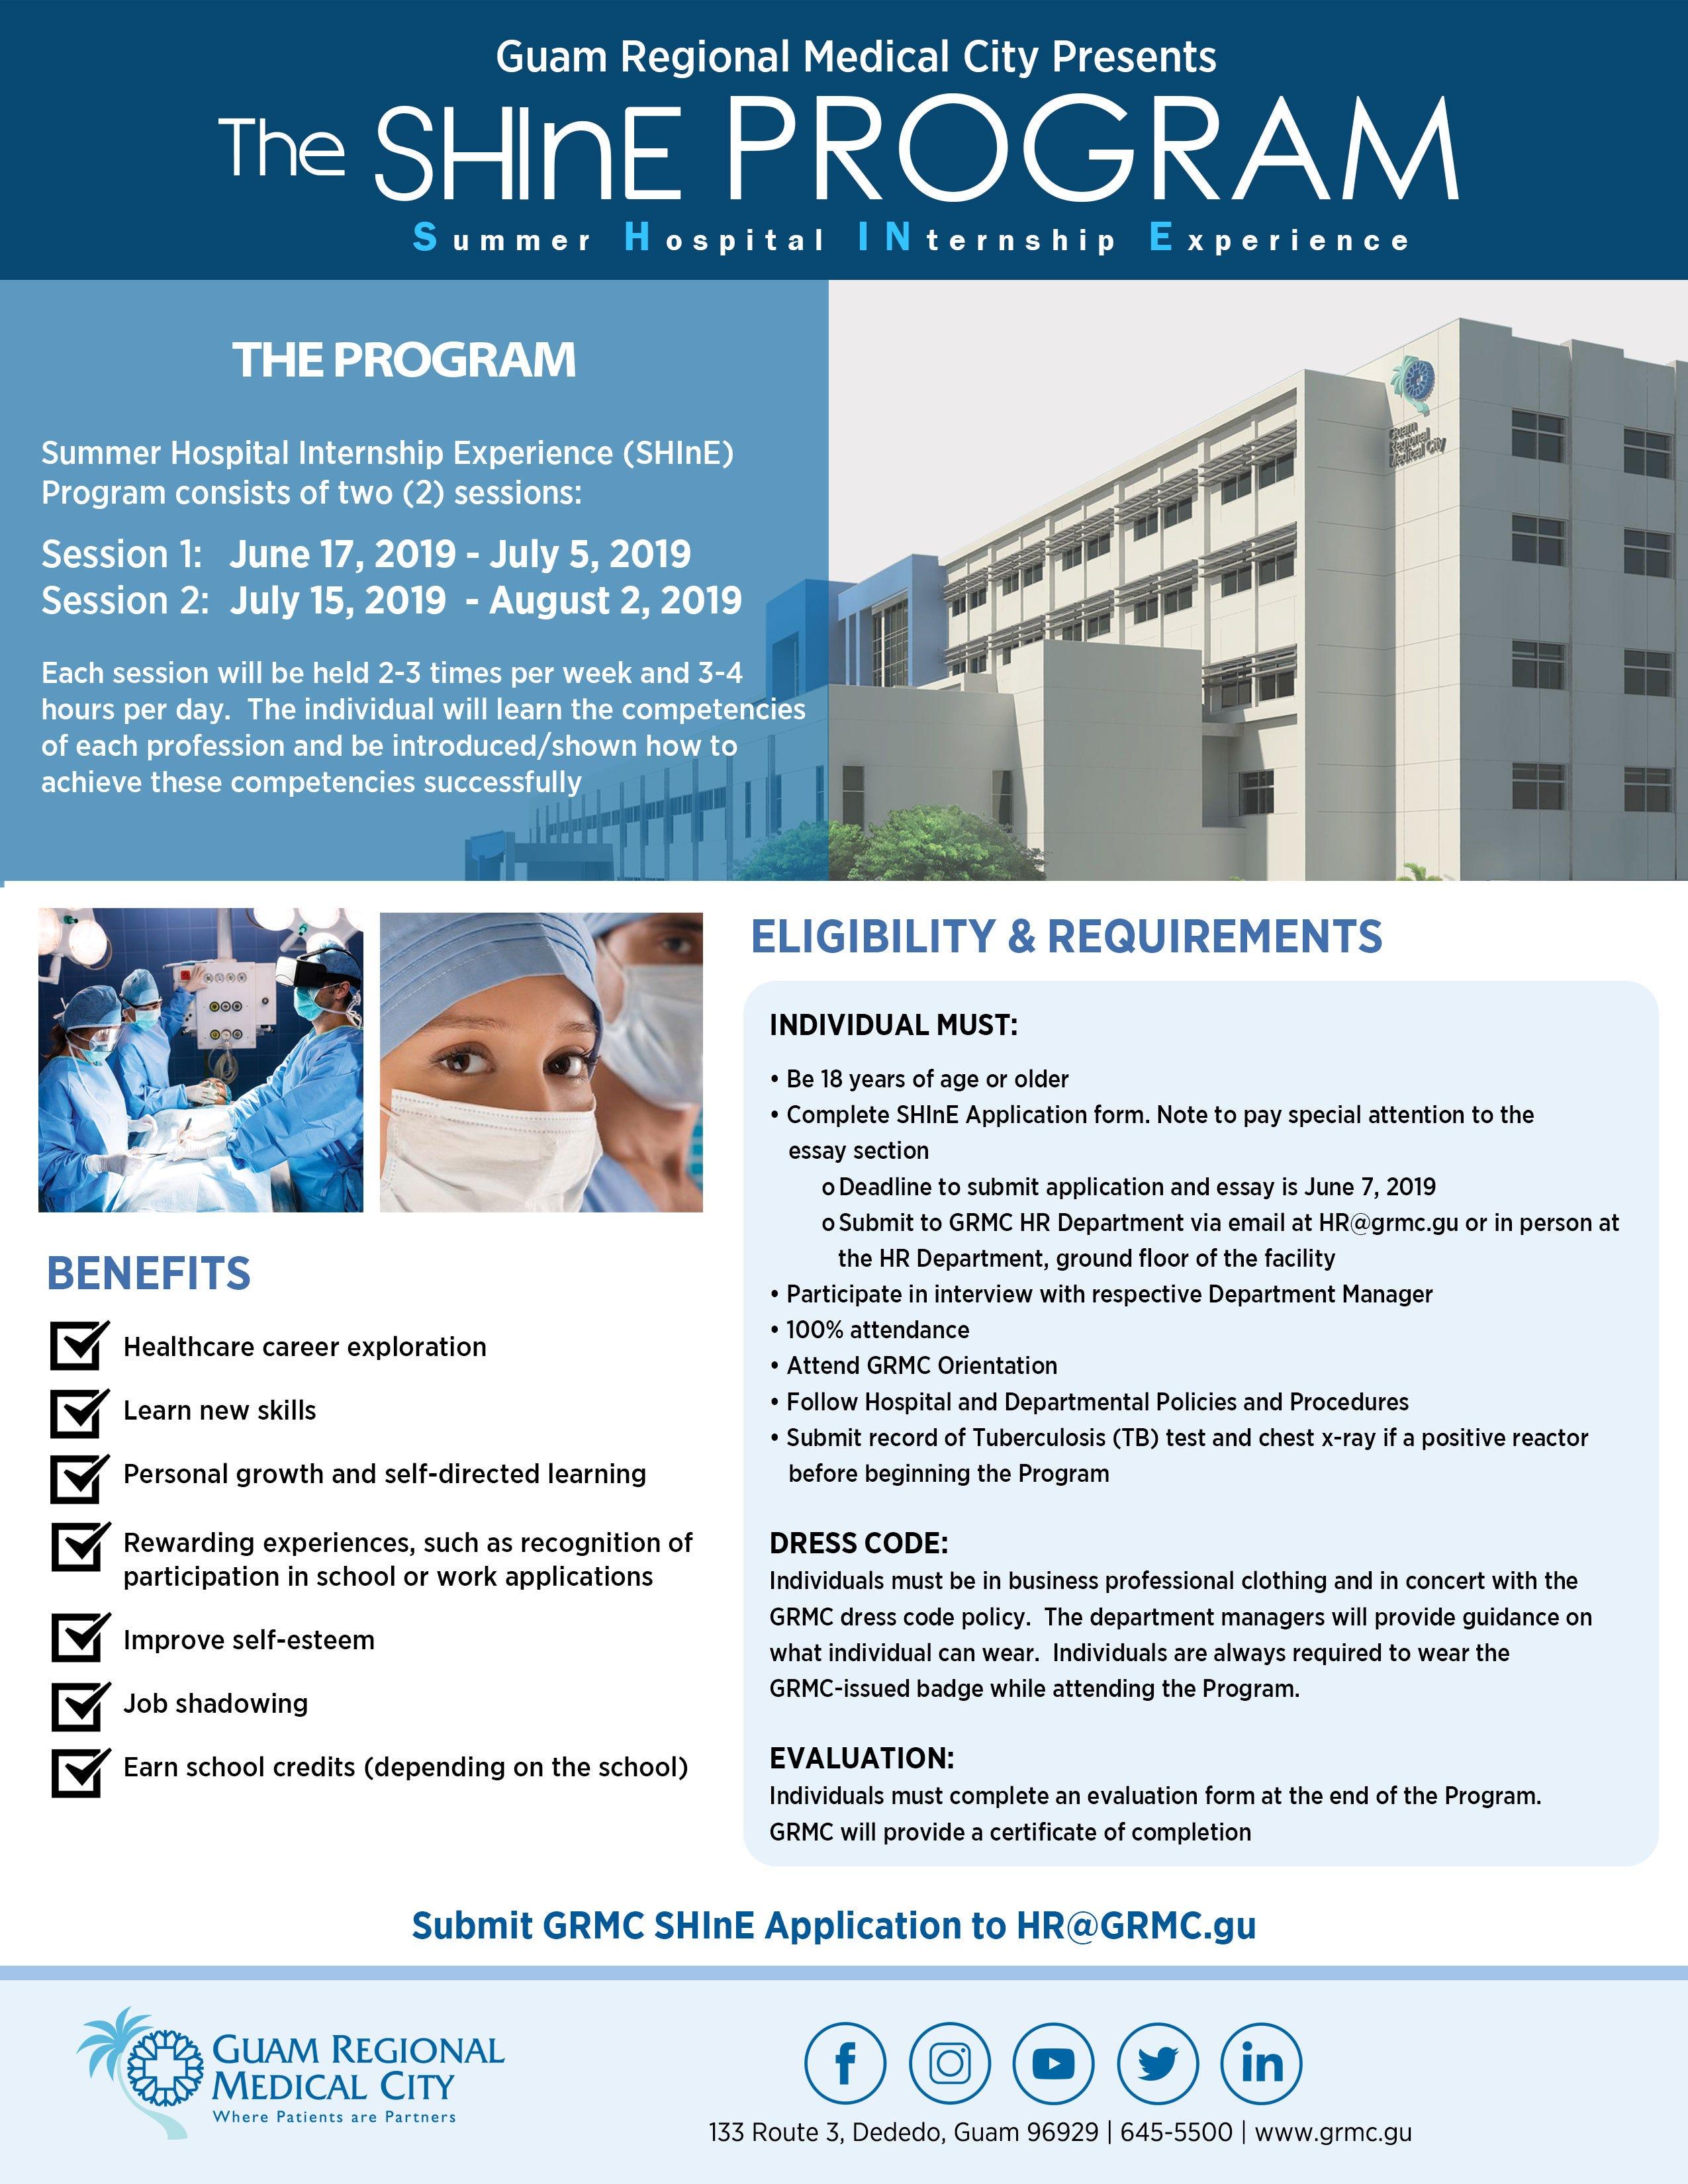 GRMC offers summer hospital internship program